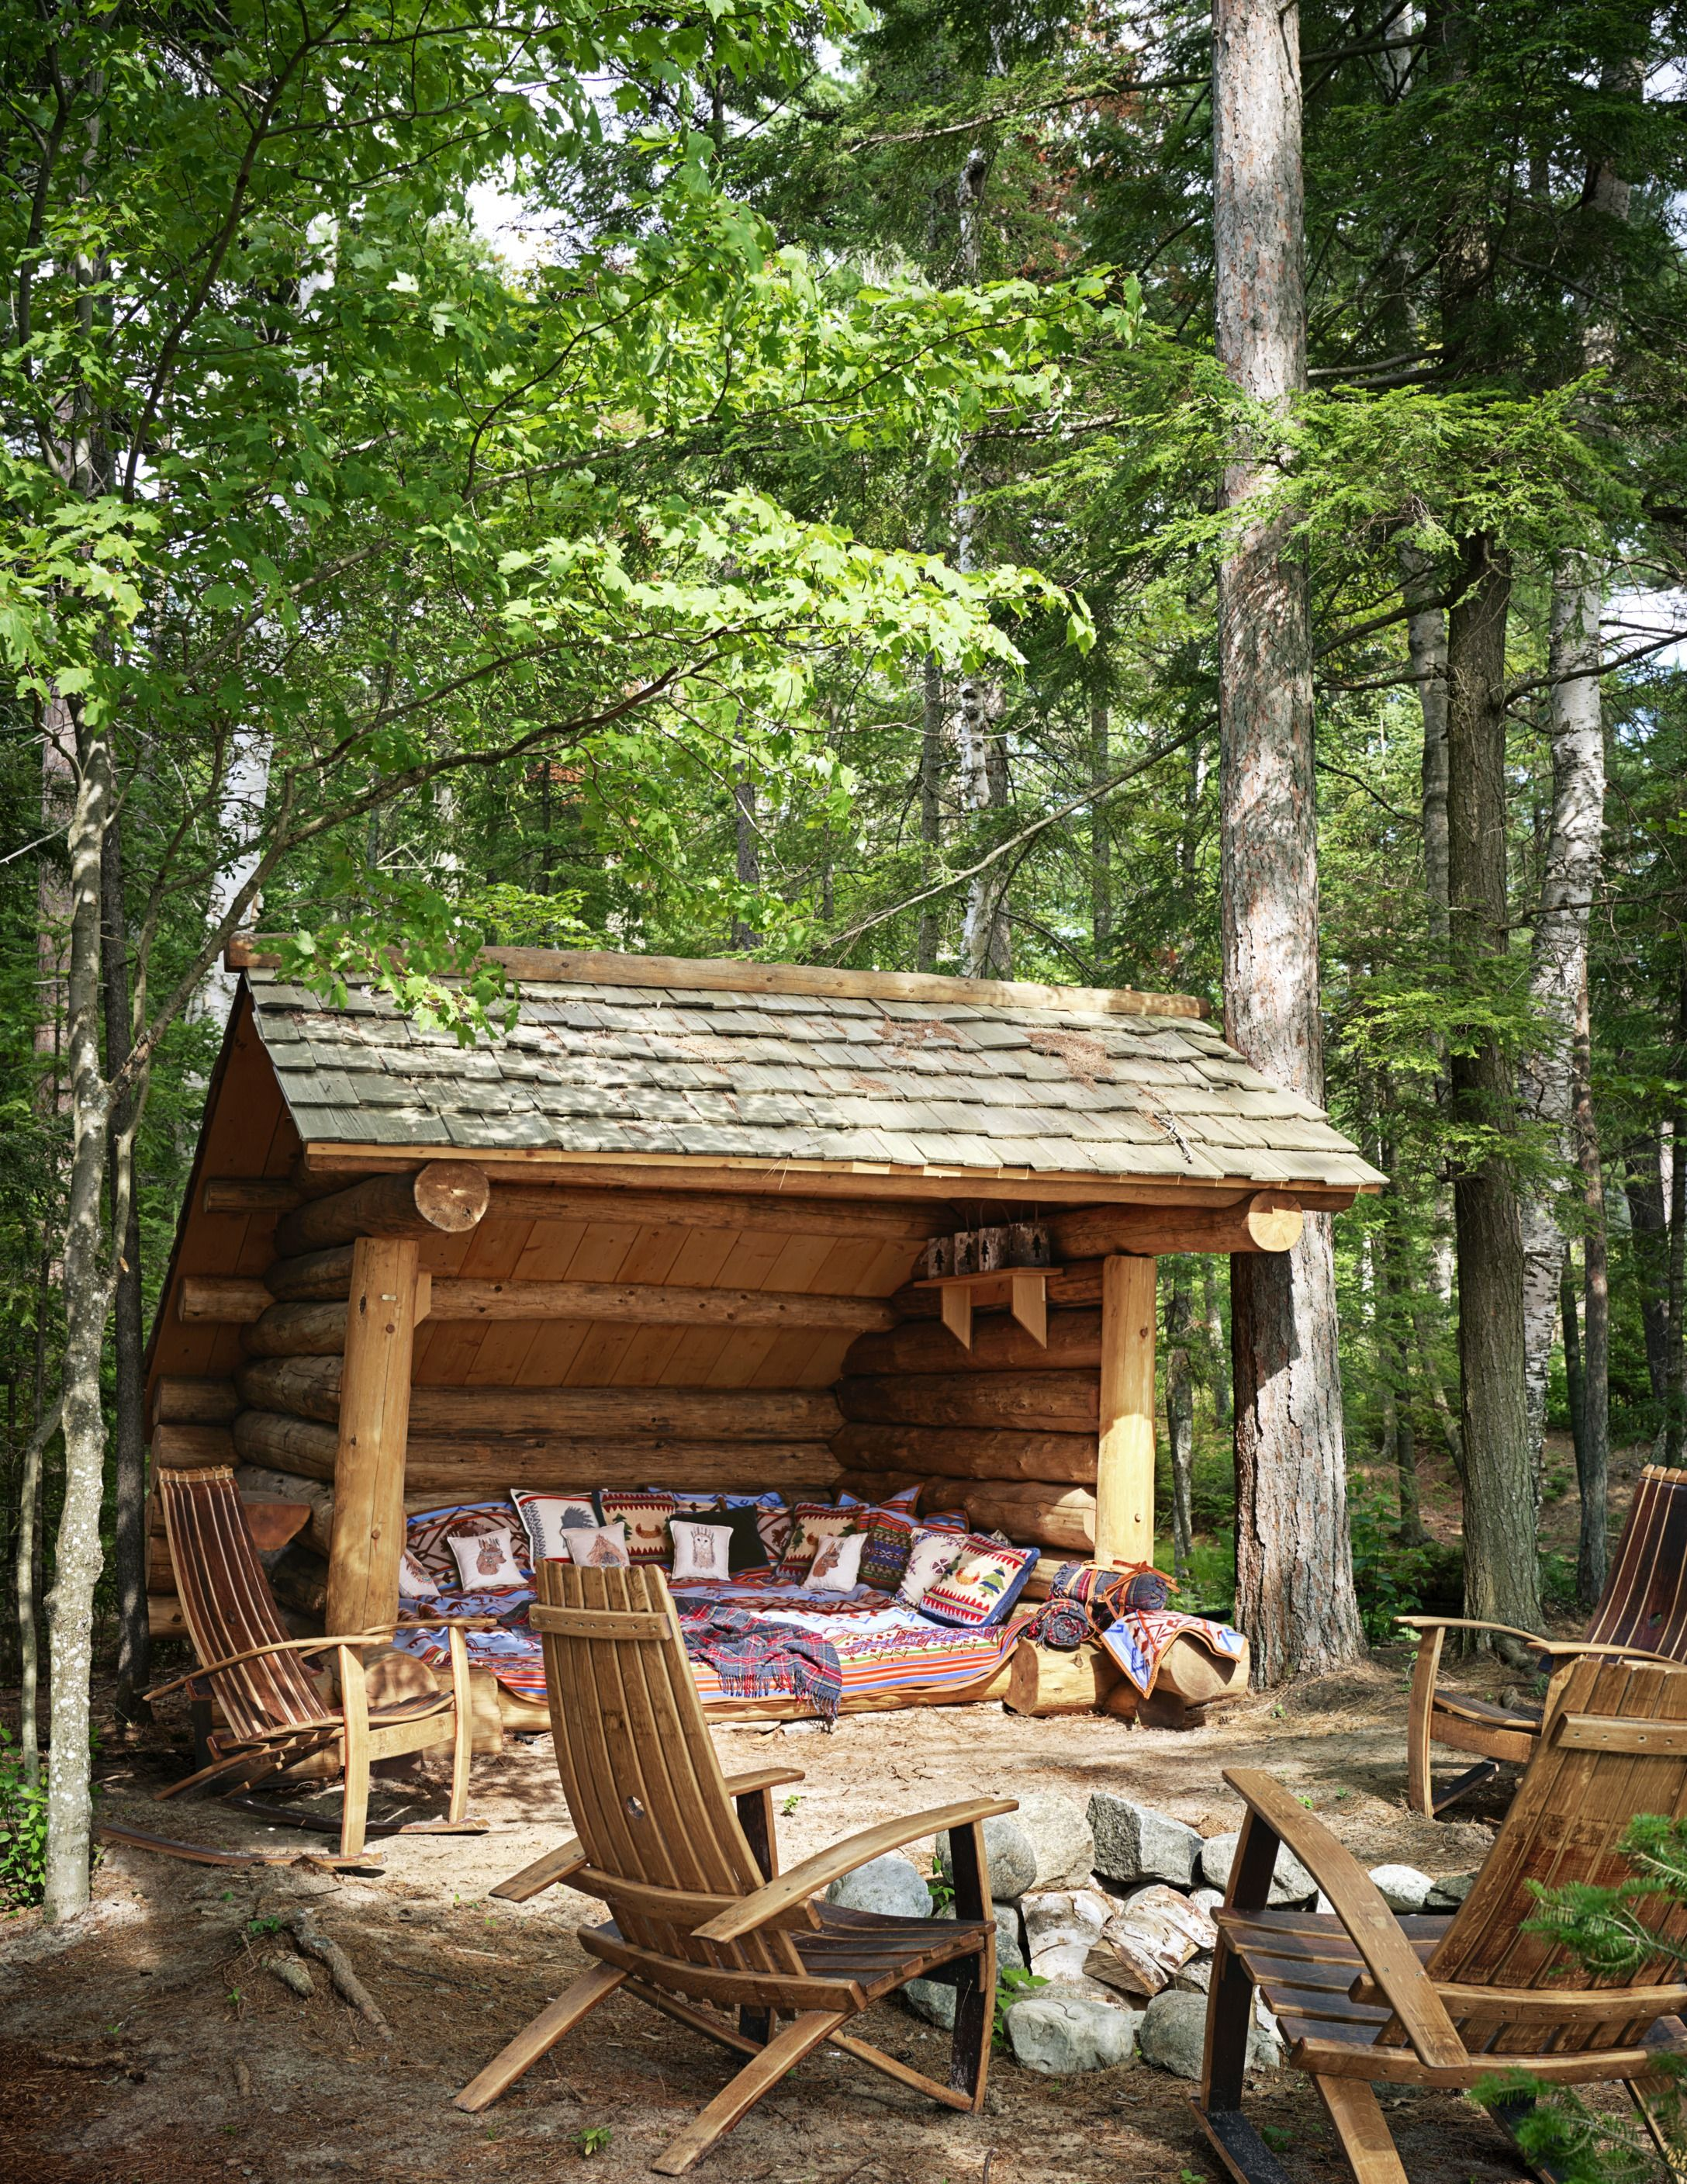 14 Best Backyard Ideas - Easy DIY Backyard Design Tips